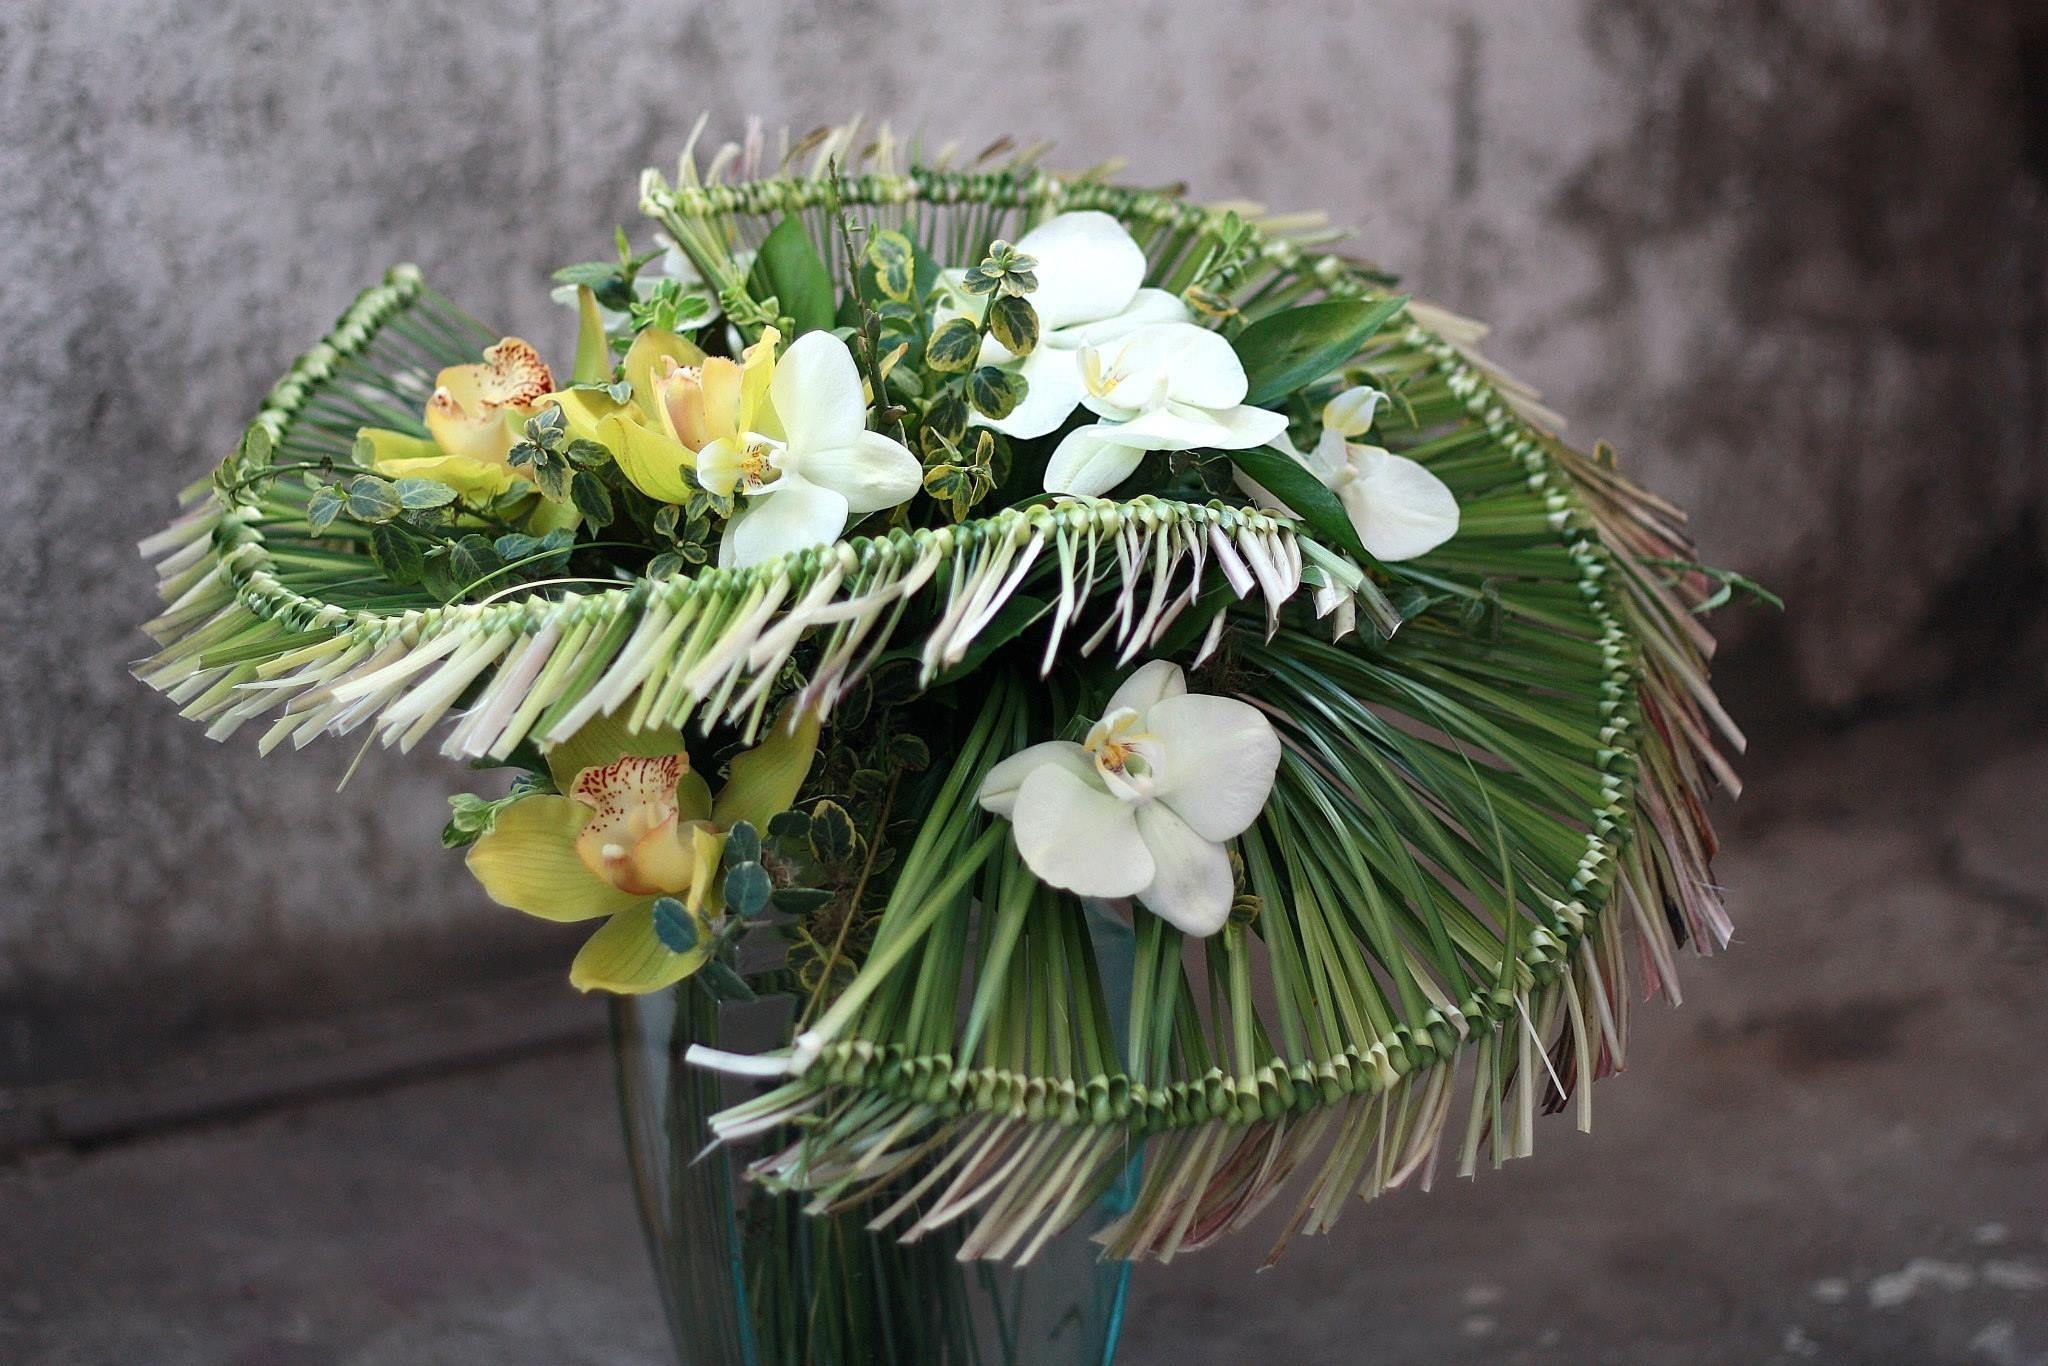 Artist Andrew Gromakov Gorgeous Grass Collar Technique Florystyka